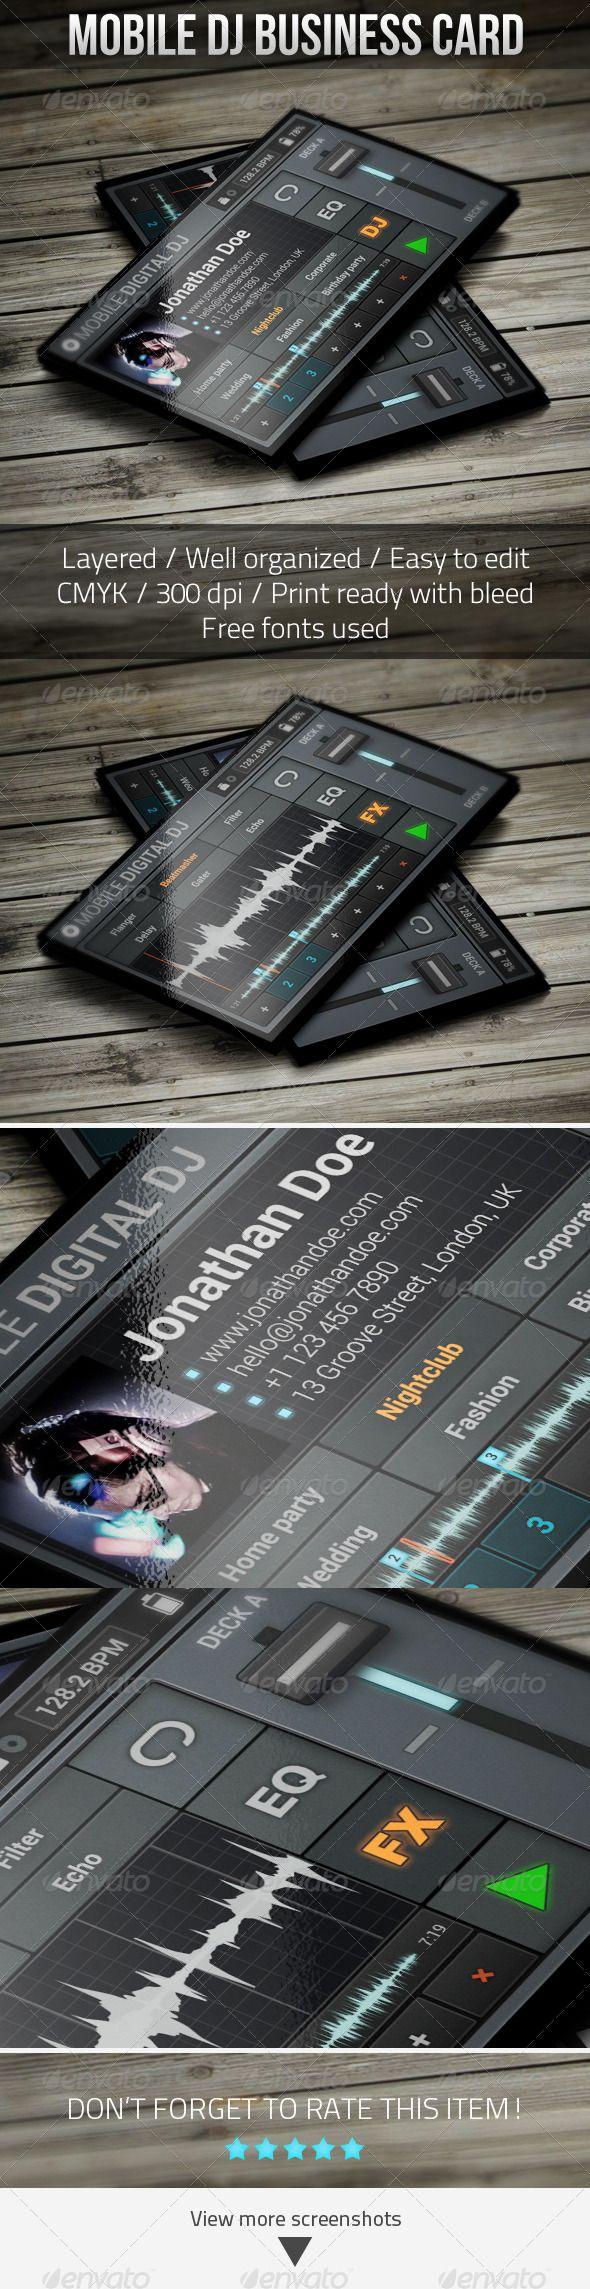 Mobile Digital DJ Business Card | Dj business cards, Dj and Business ...